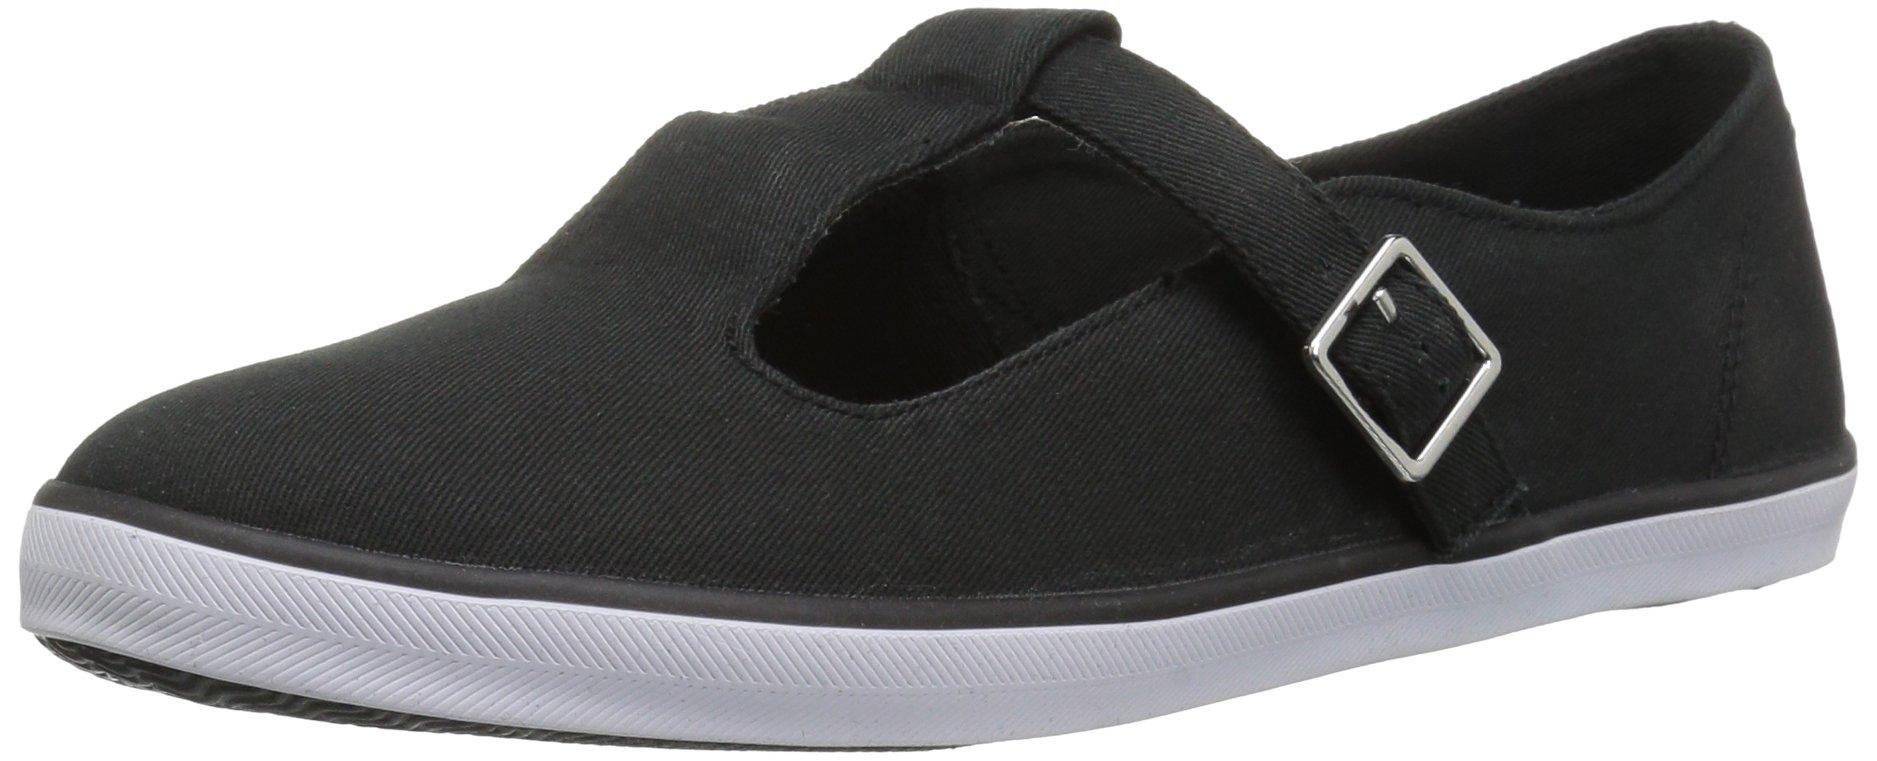 The Children's Place Kids' Sneaker,Black-EBG U TSTRP TWRL,13 M US Little Kid